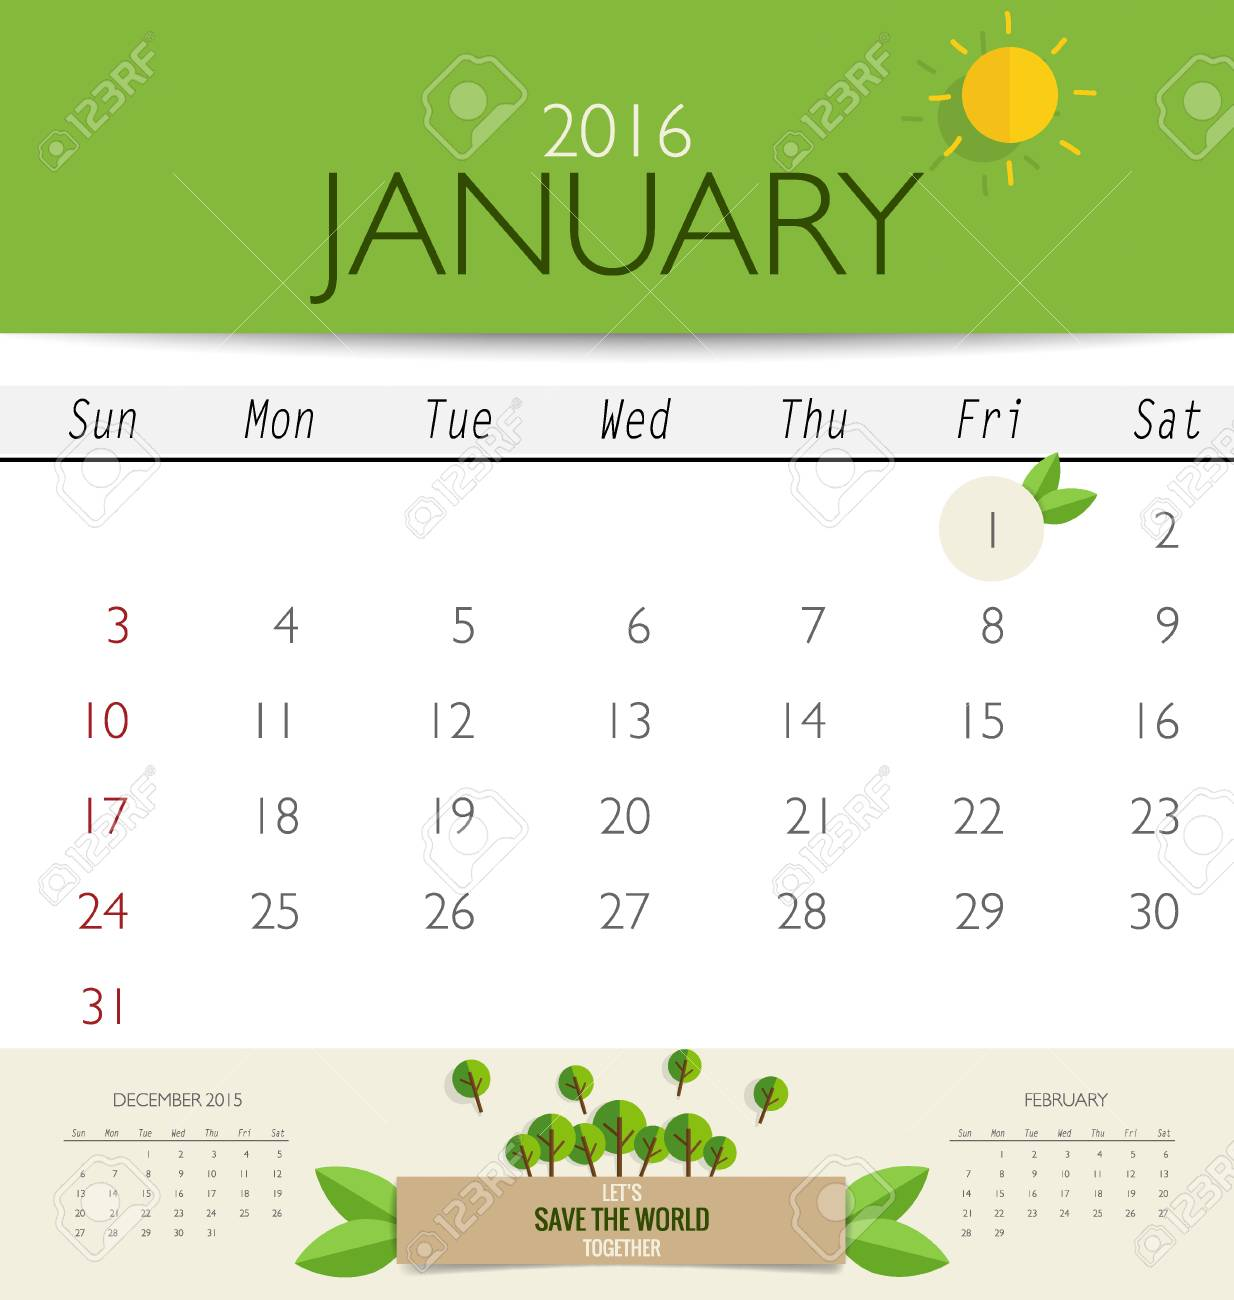 Kalender 2016, Monatskalender Vorlage Für Januar. Vektor ...